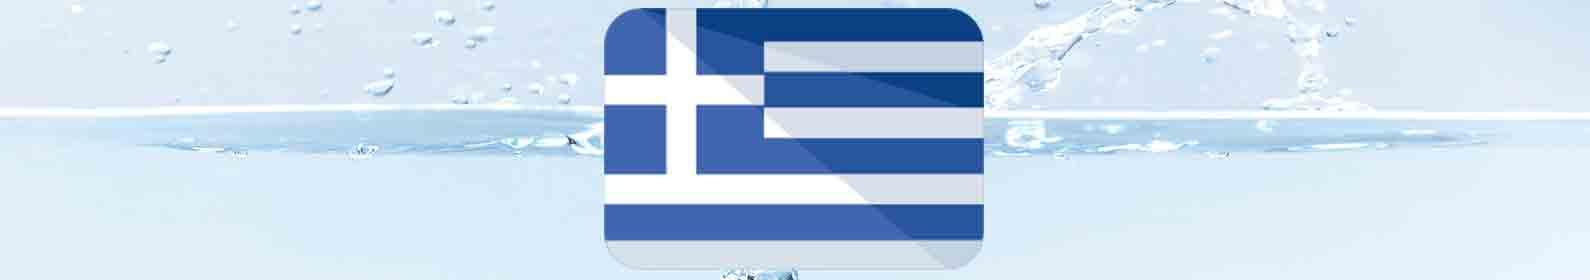 tratamento-de-agua-grecia.jpg